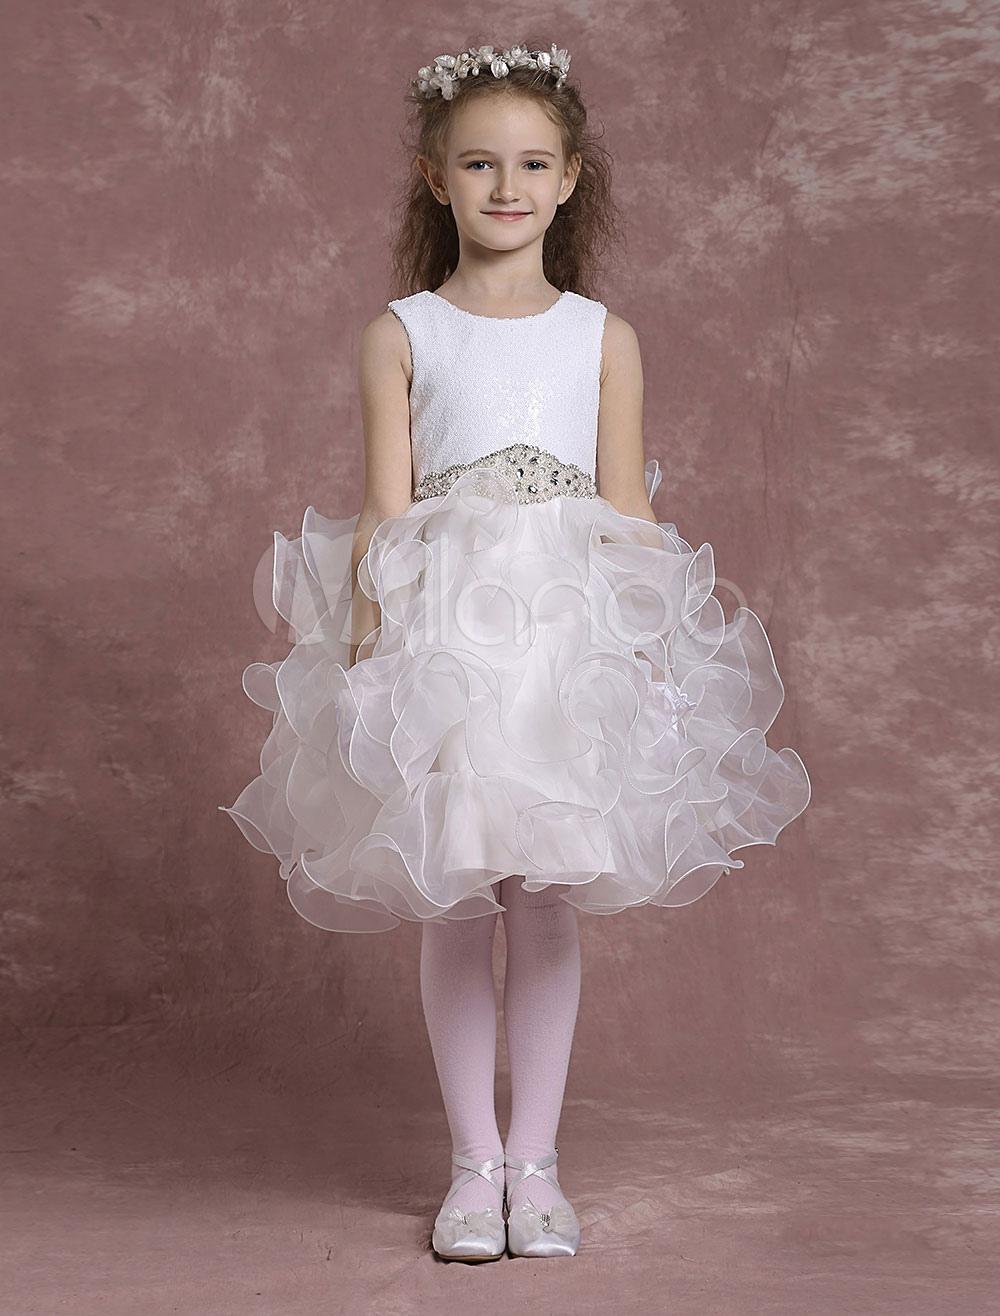 a6adc2d91 Flower Girl Dresses Knee Length Organza Pageant Dresses Toddler's Cute  Crewneck Short Ball Gown - Milanoo.com